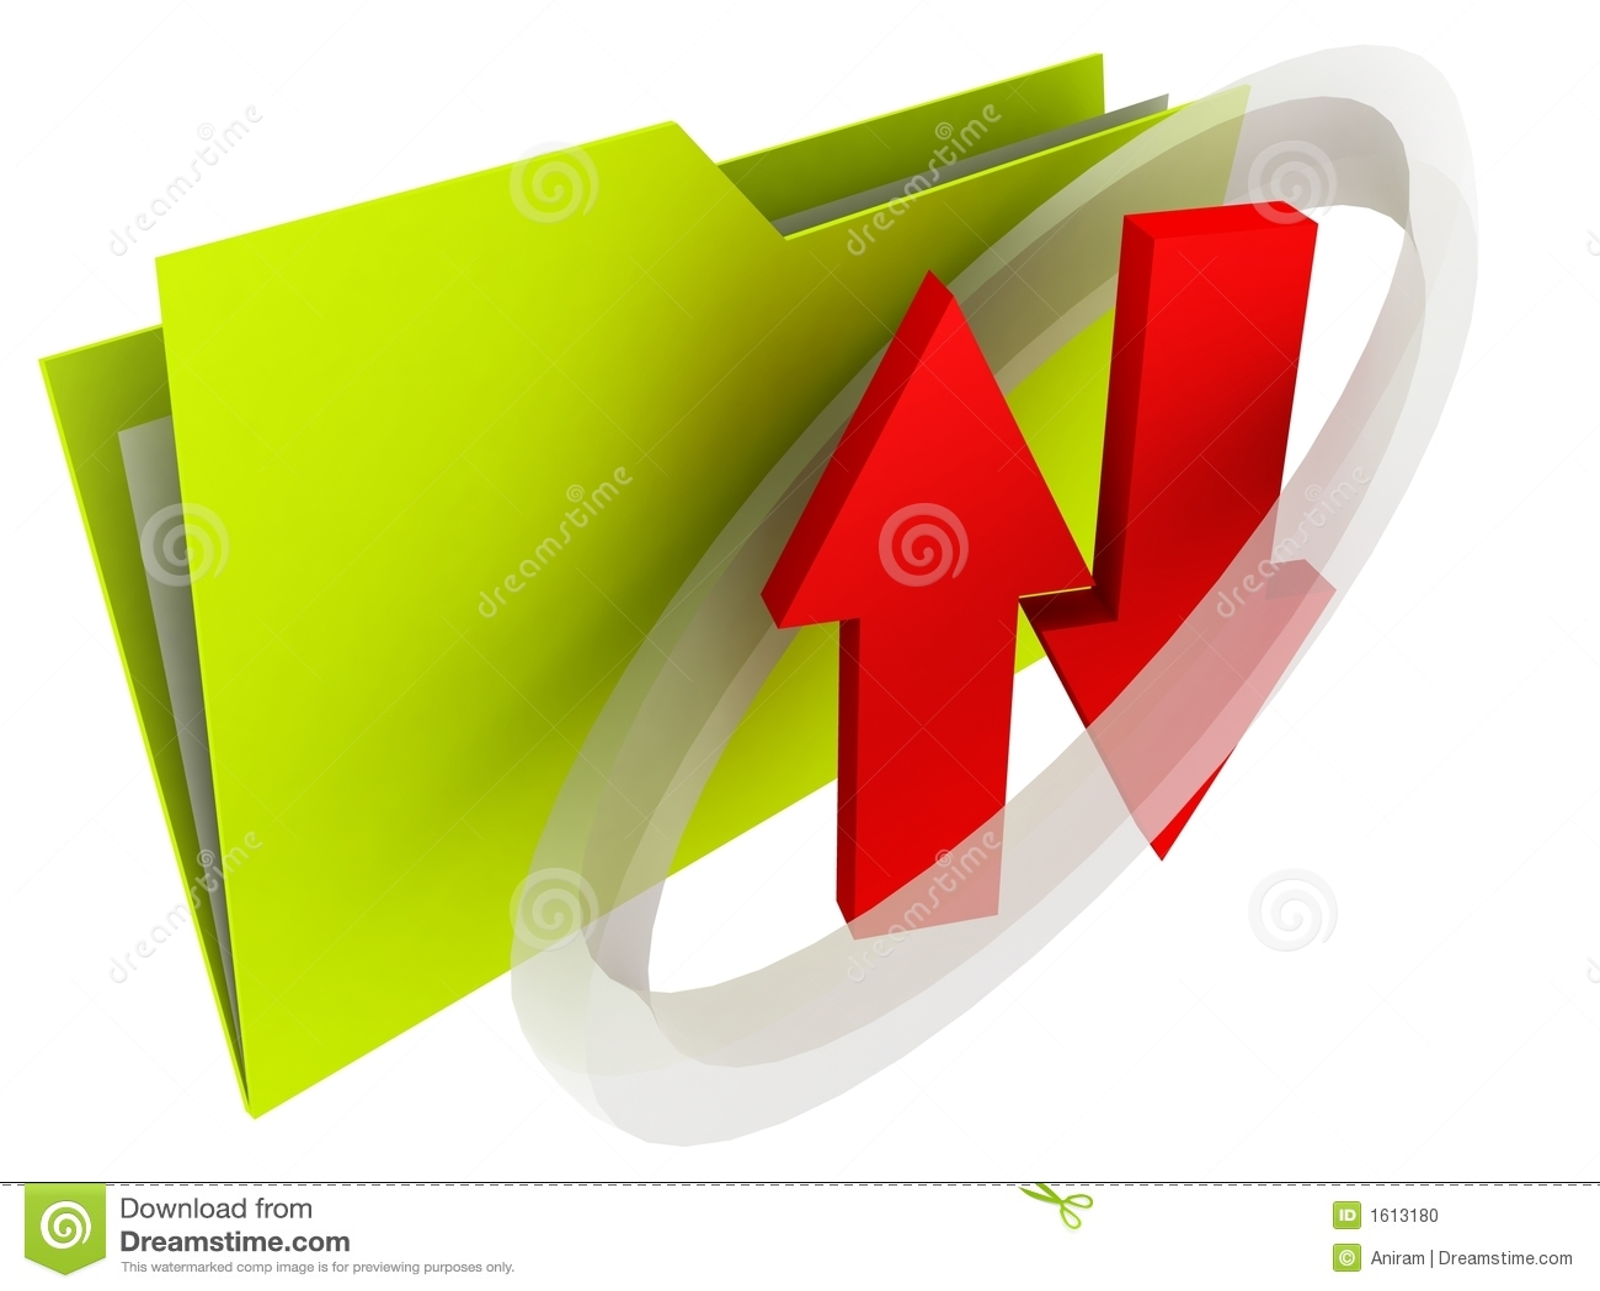 Folder File Sharing